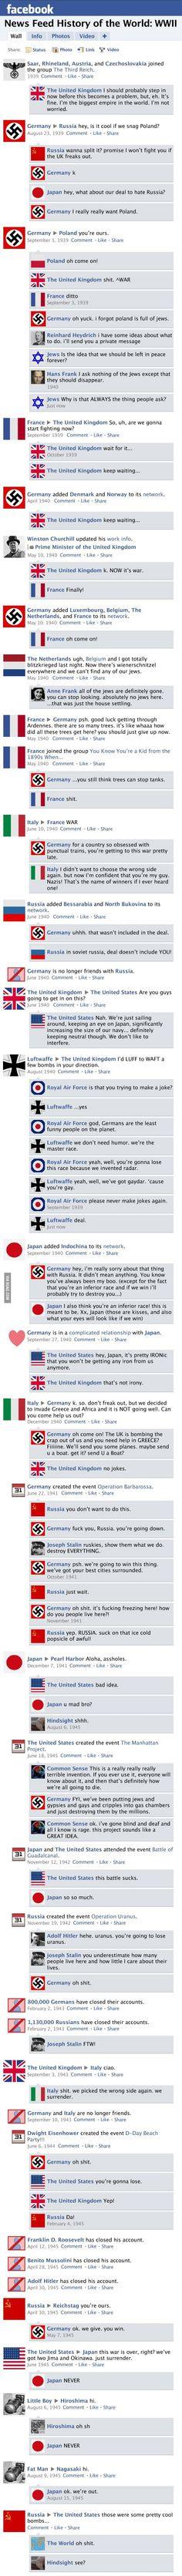 2. Verdenskrig facebook-feed